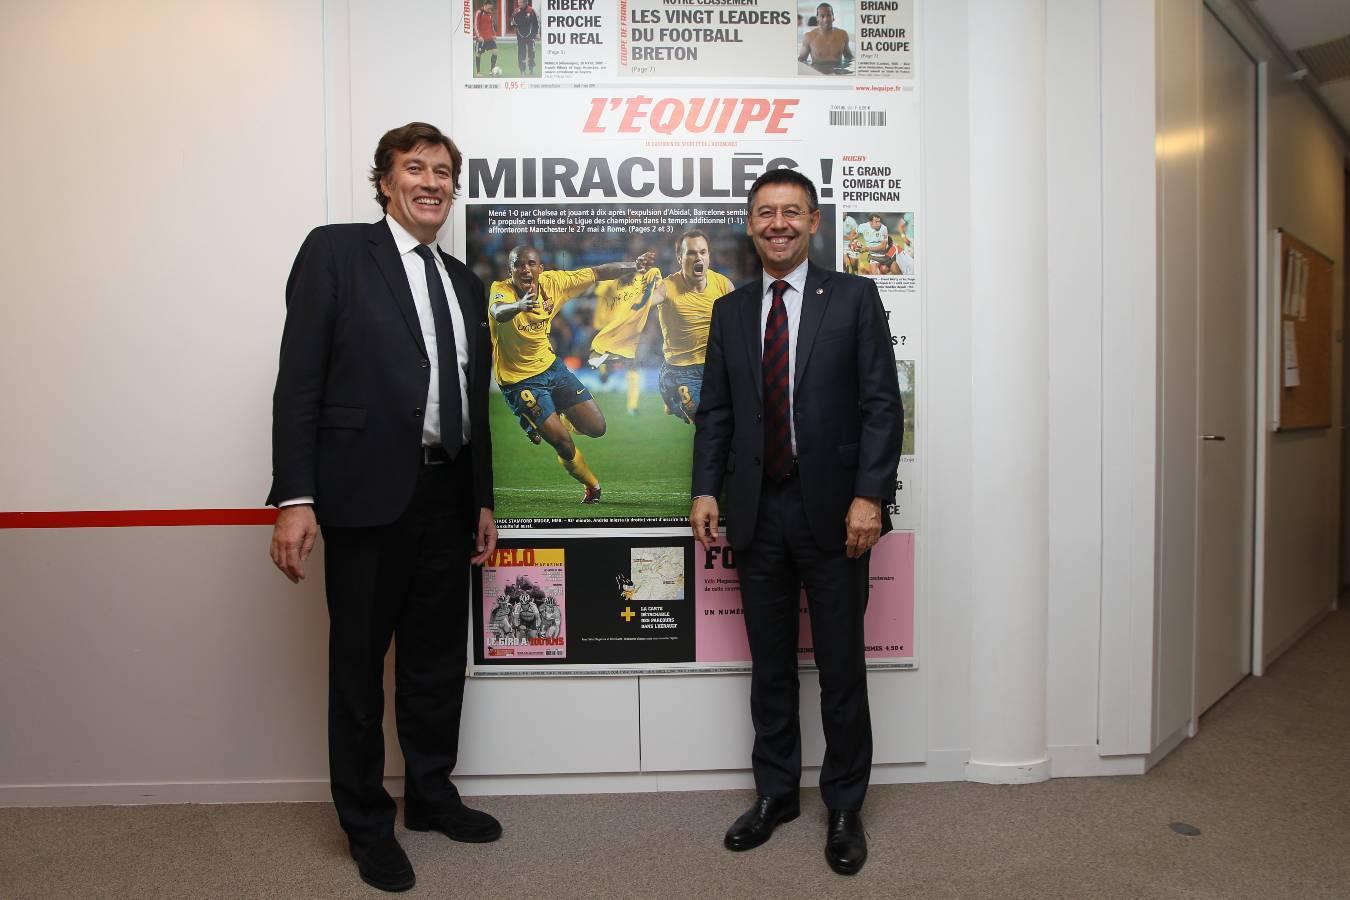 L'Équipe receives president Bartomeu